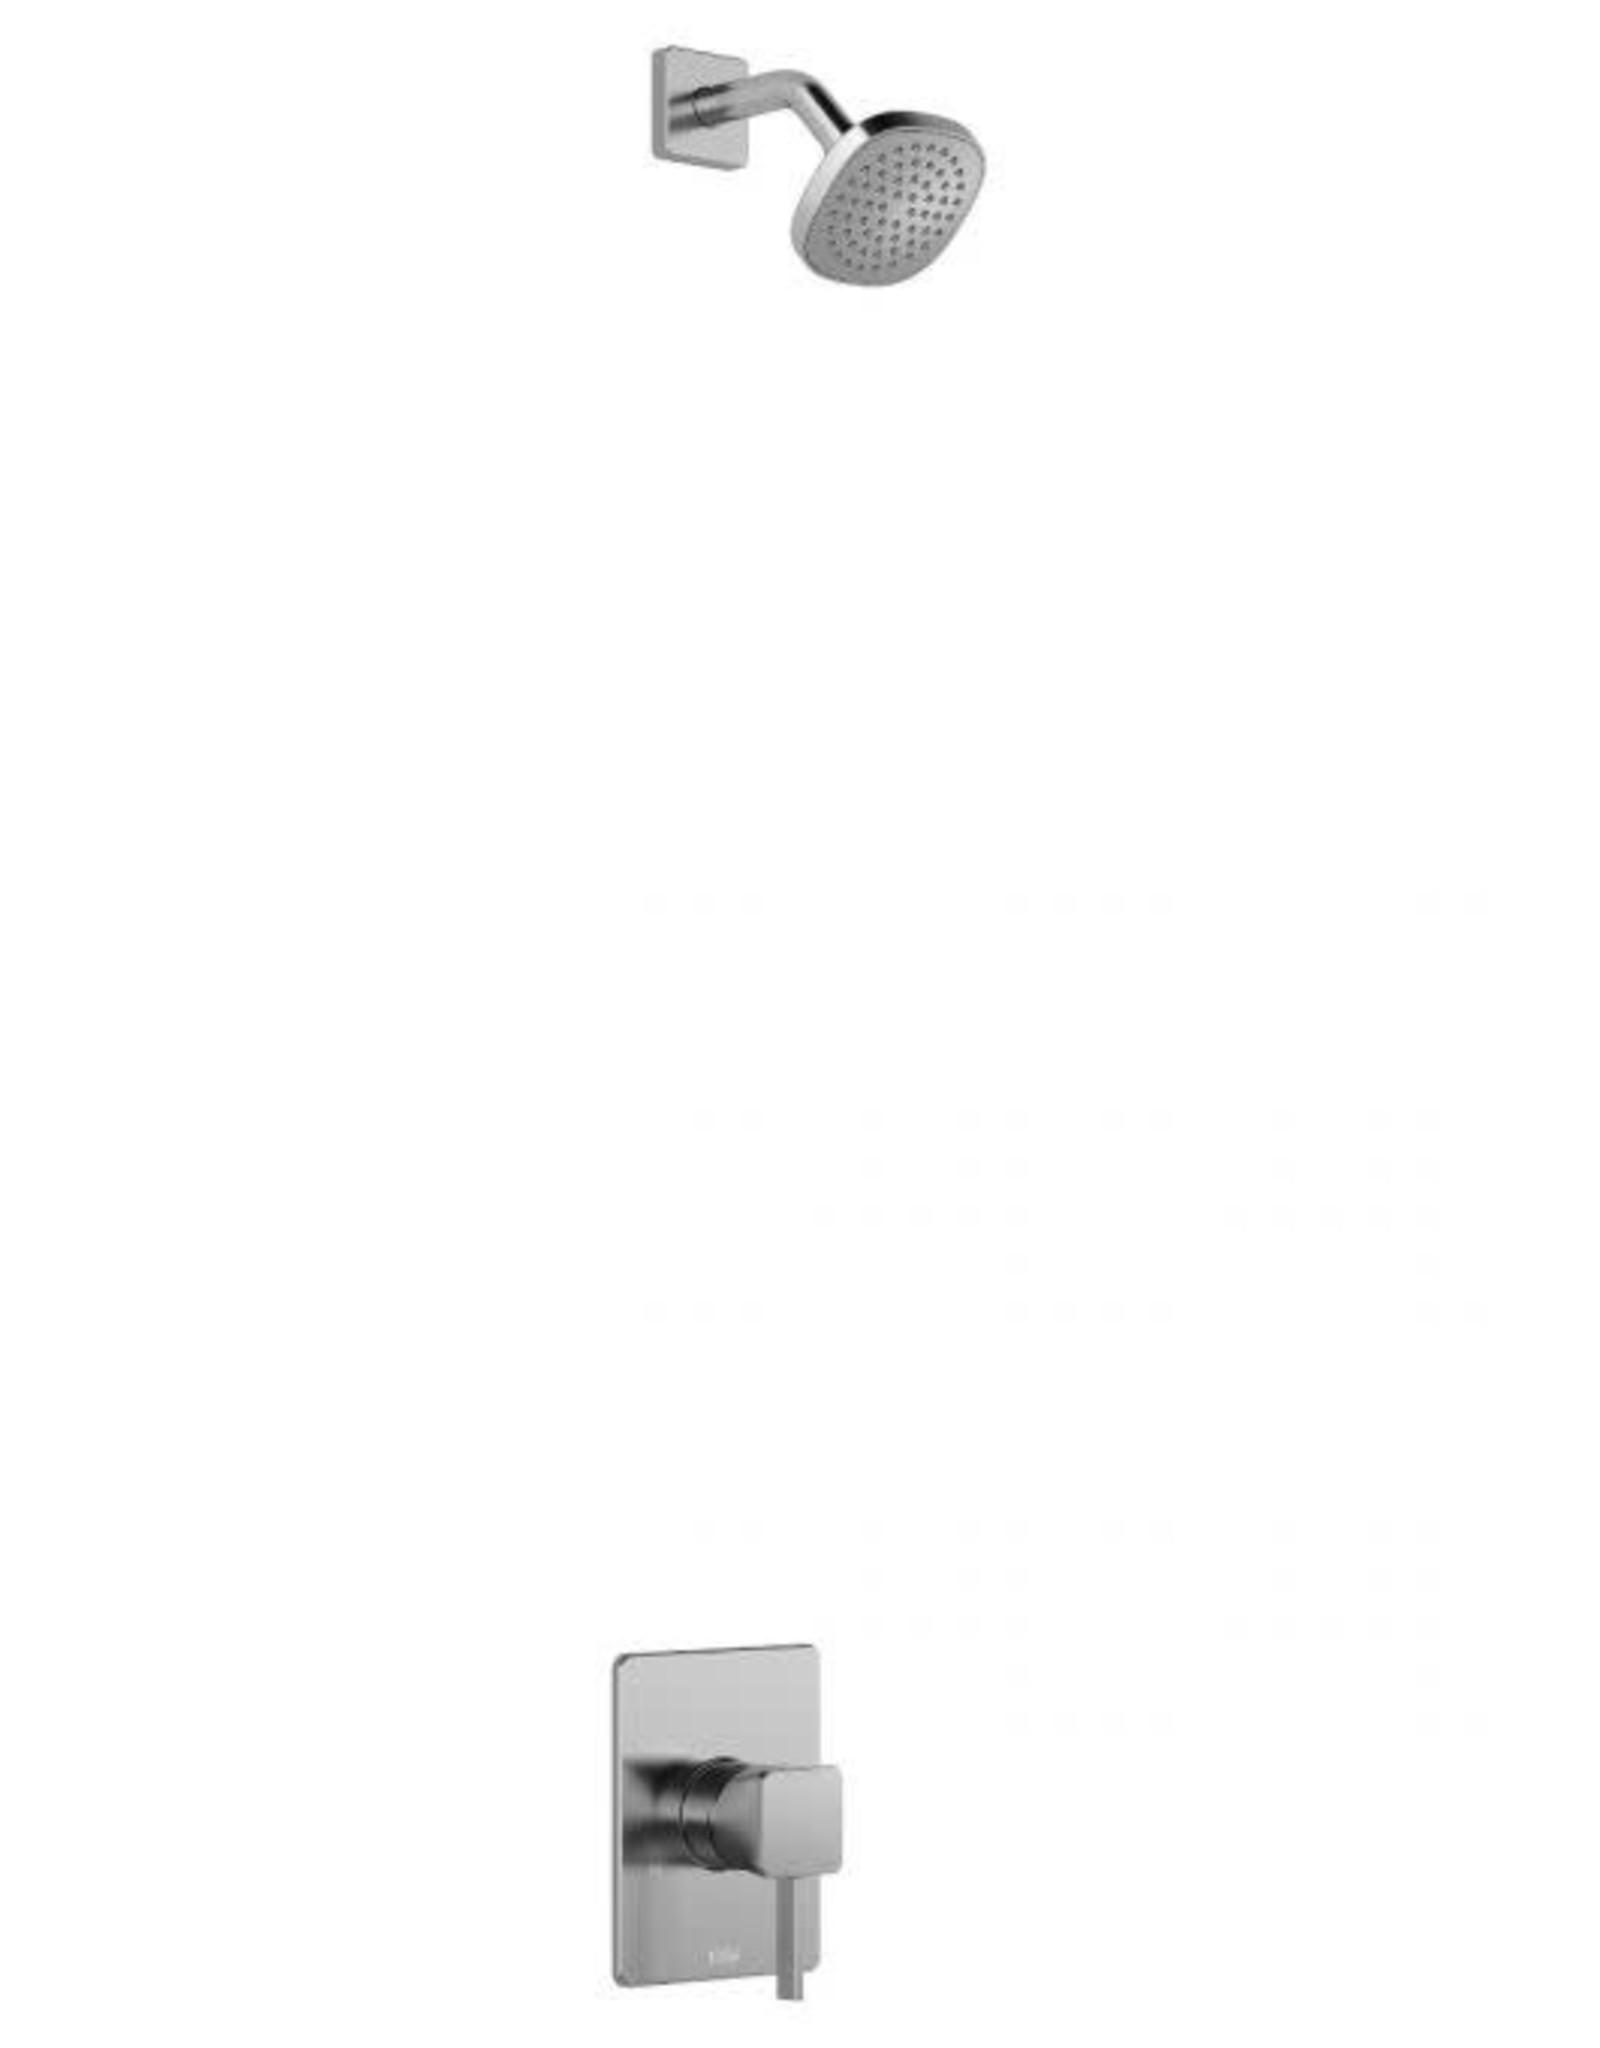 Kalia Kalia Sobrio PB5- Showerhead- Chrome